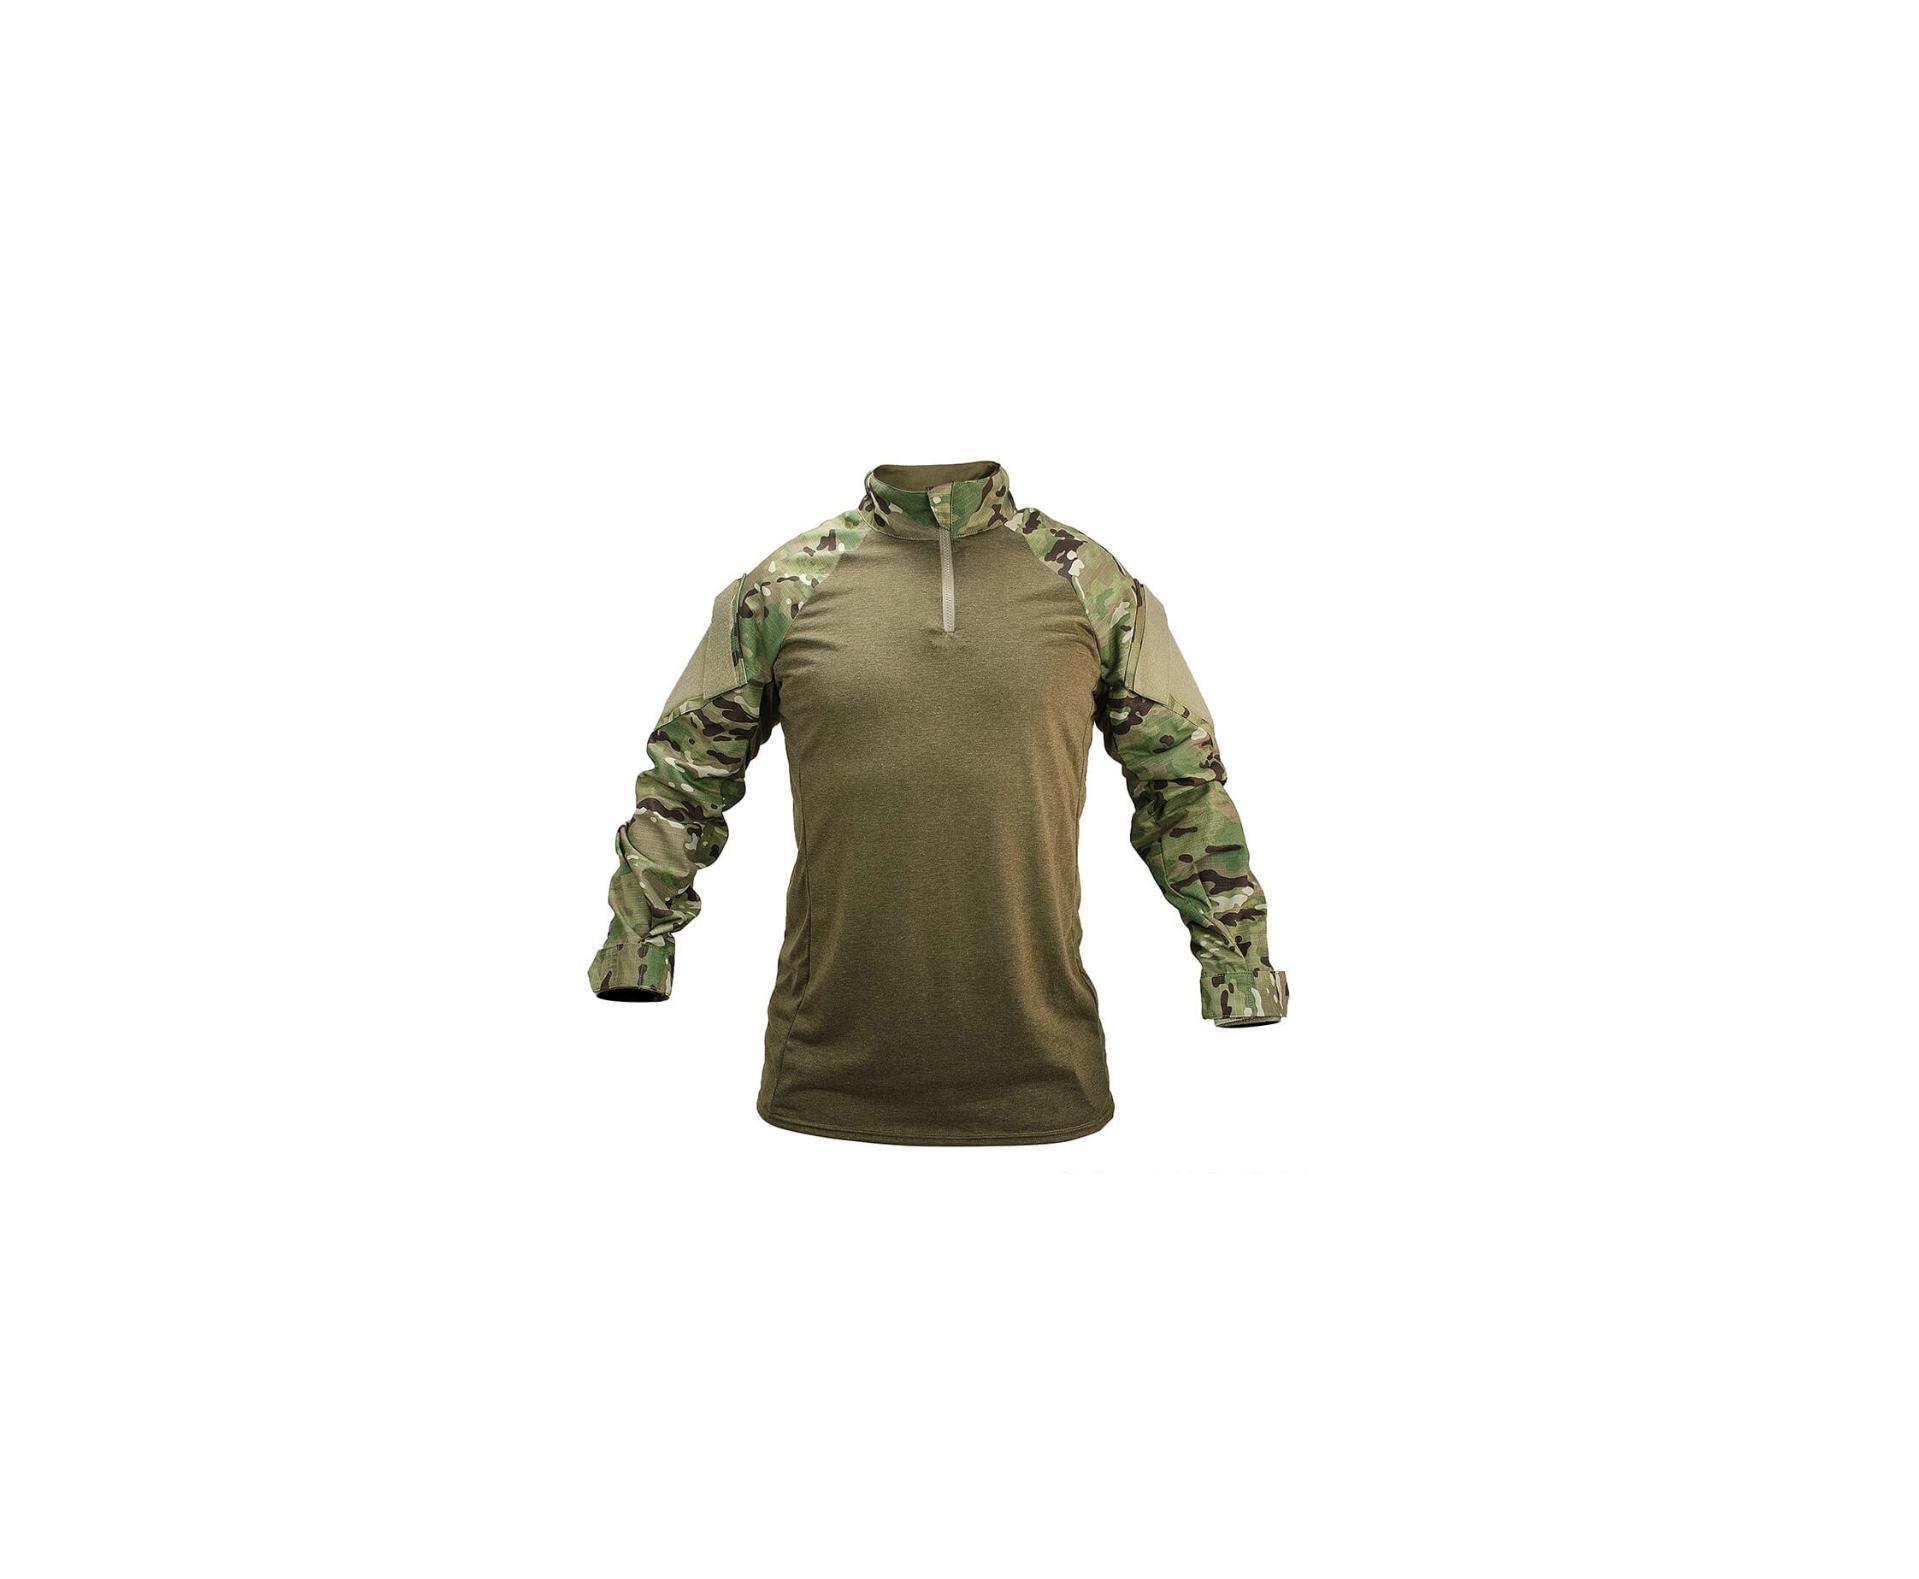 Camisa De Combate For Honor Adulto Poliester 711 Camuflado Multicam